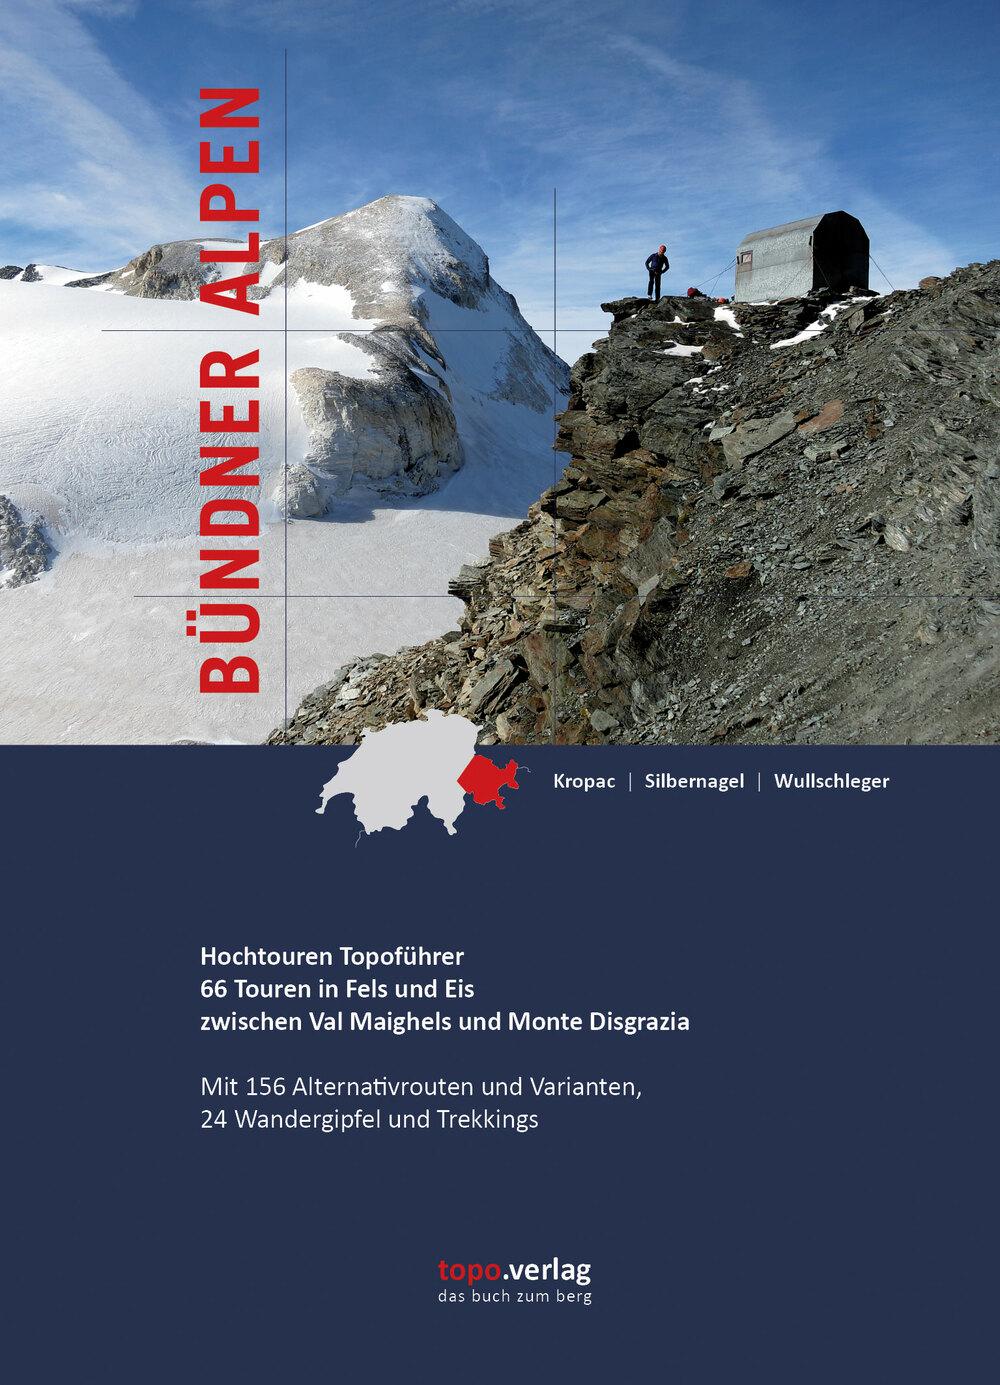 «Hochtouren Topoführer Bündner Alpen»